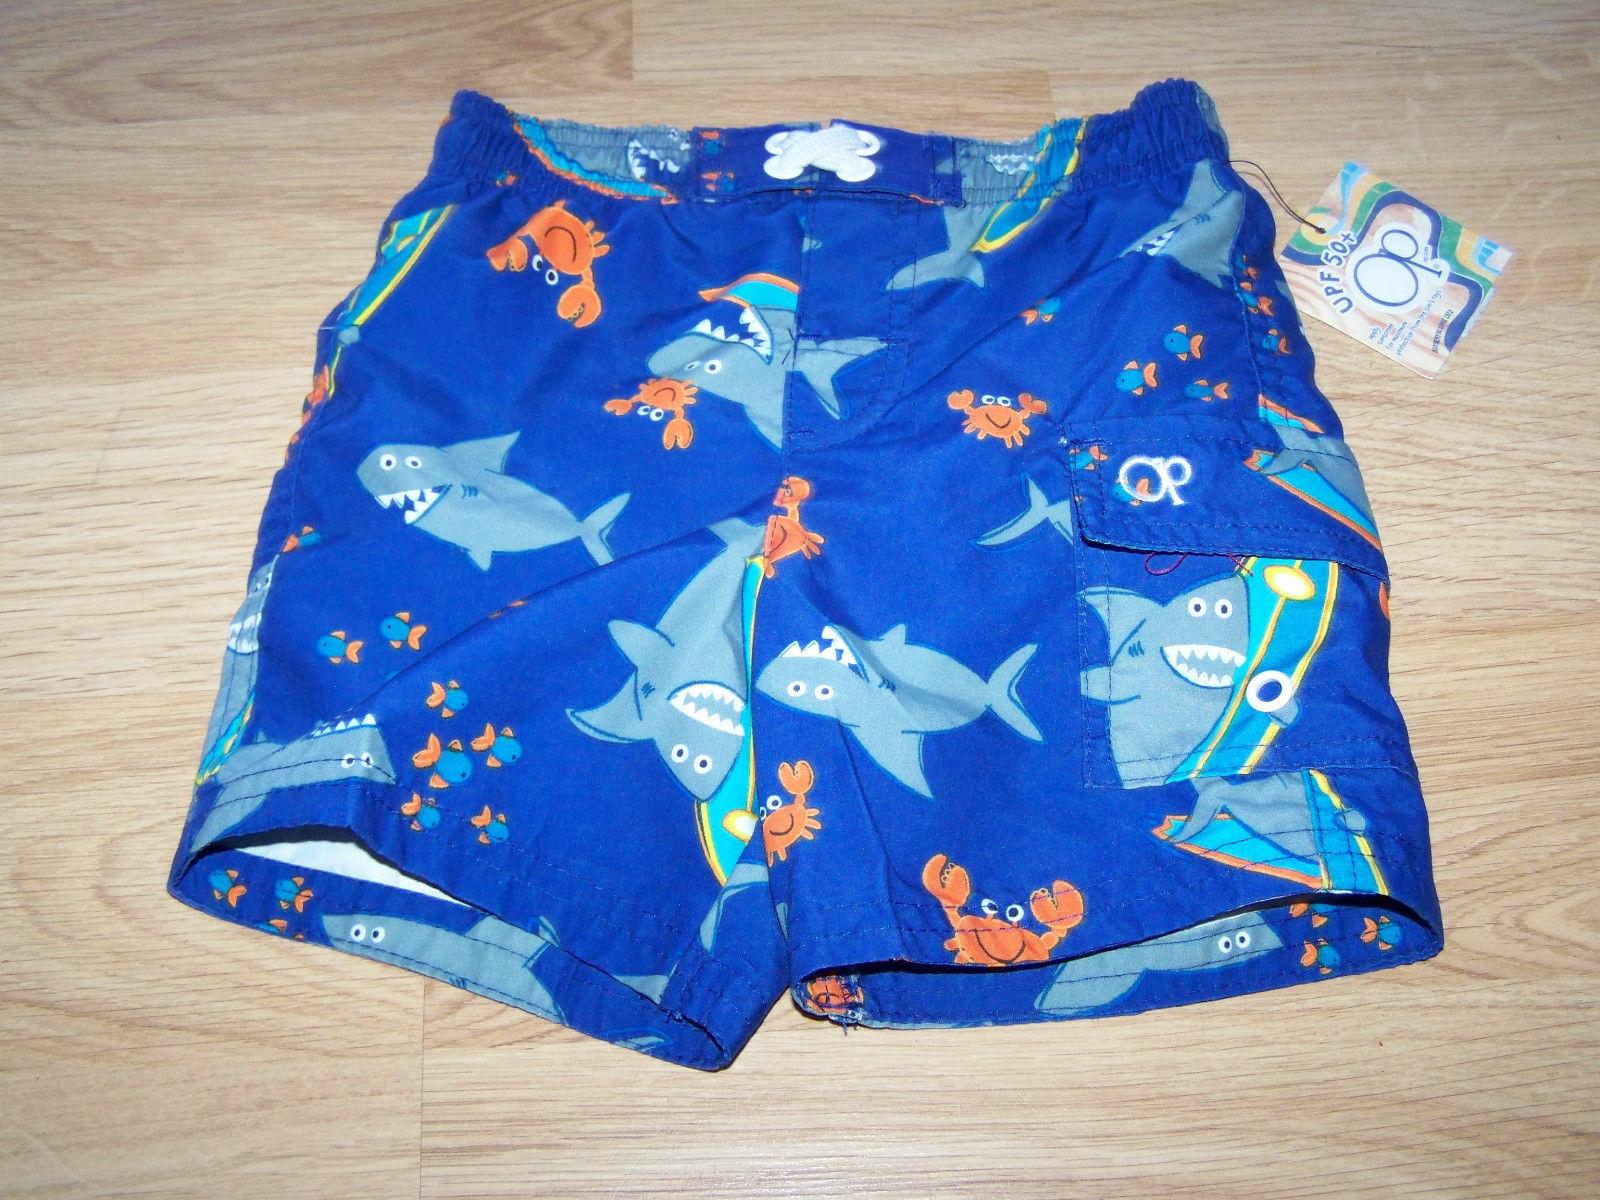 OP Baby Infant Boys Sharks Swim Trunks Shorts 6-9 Month Blue